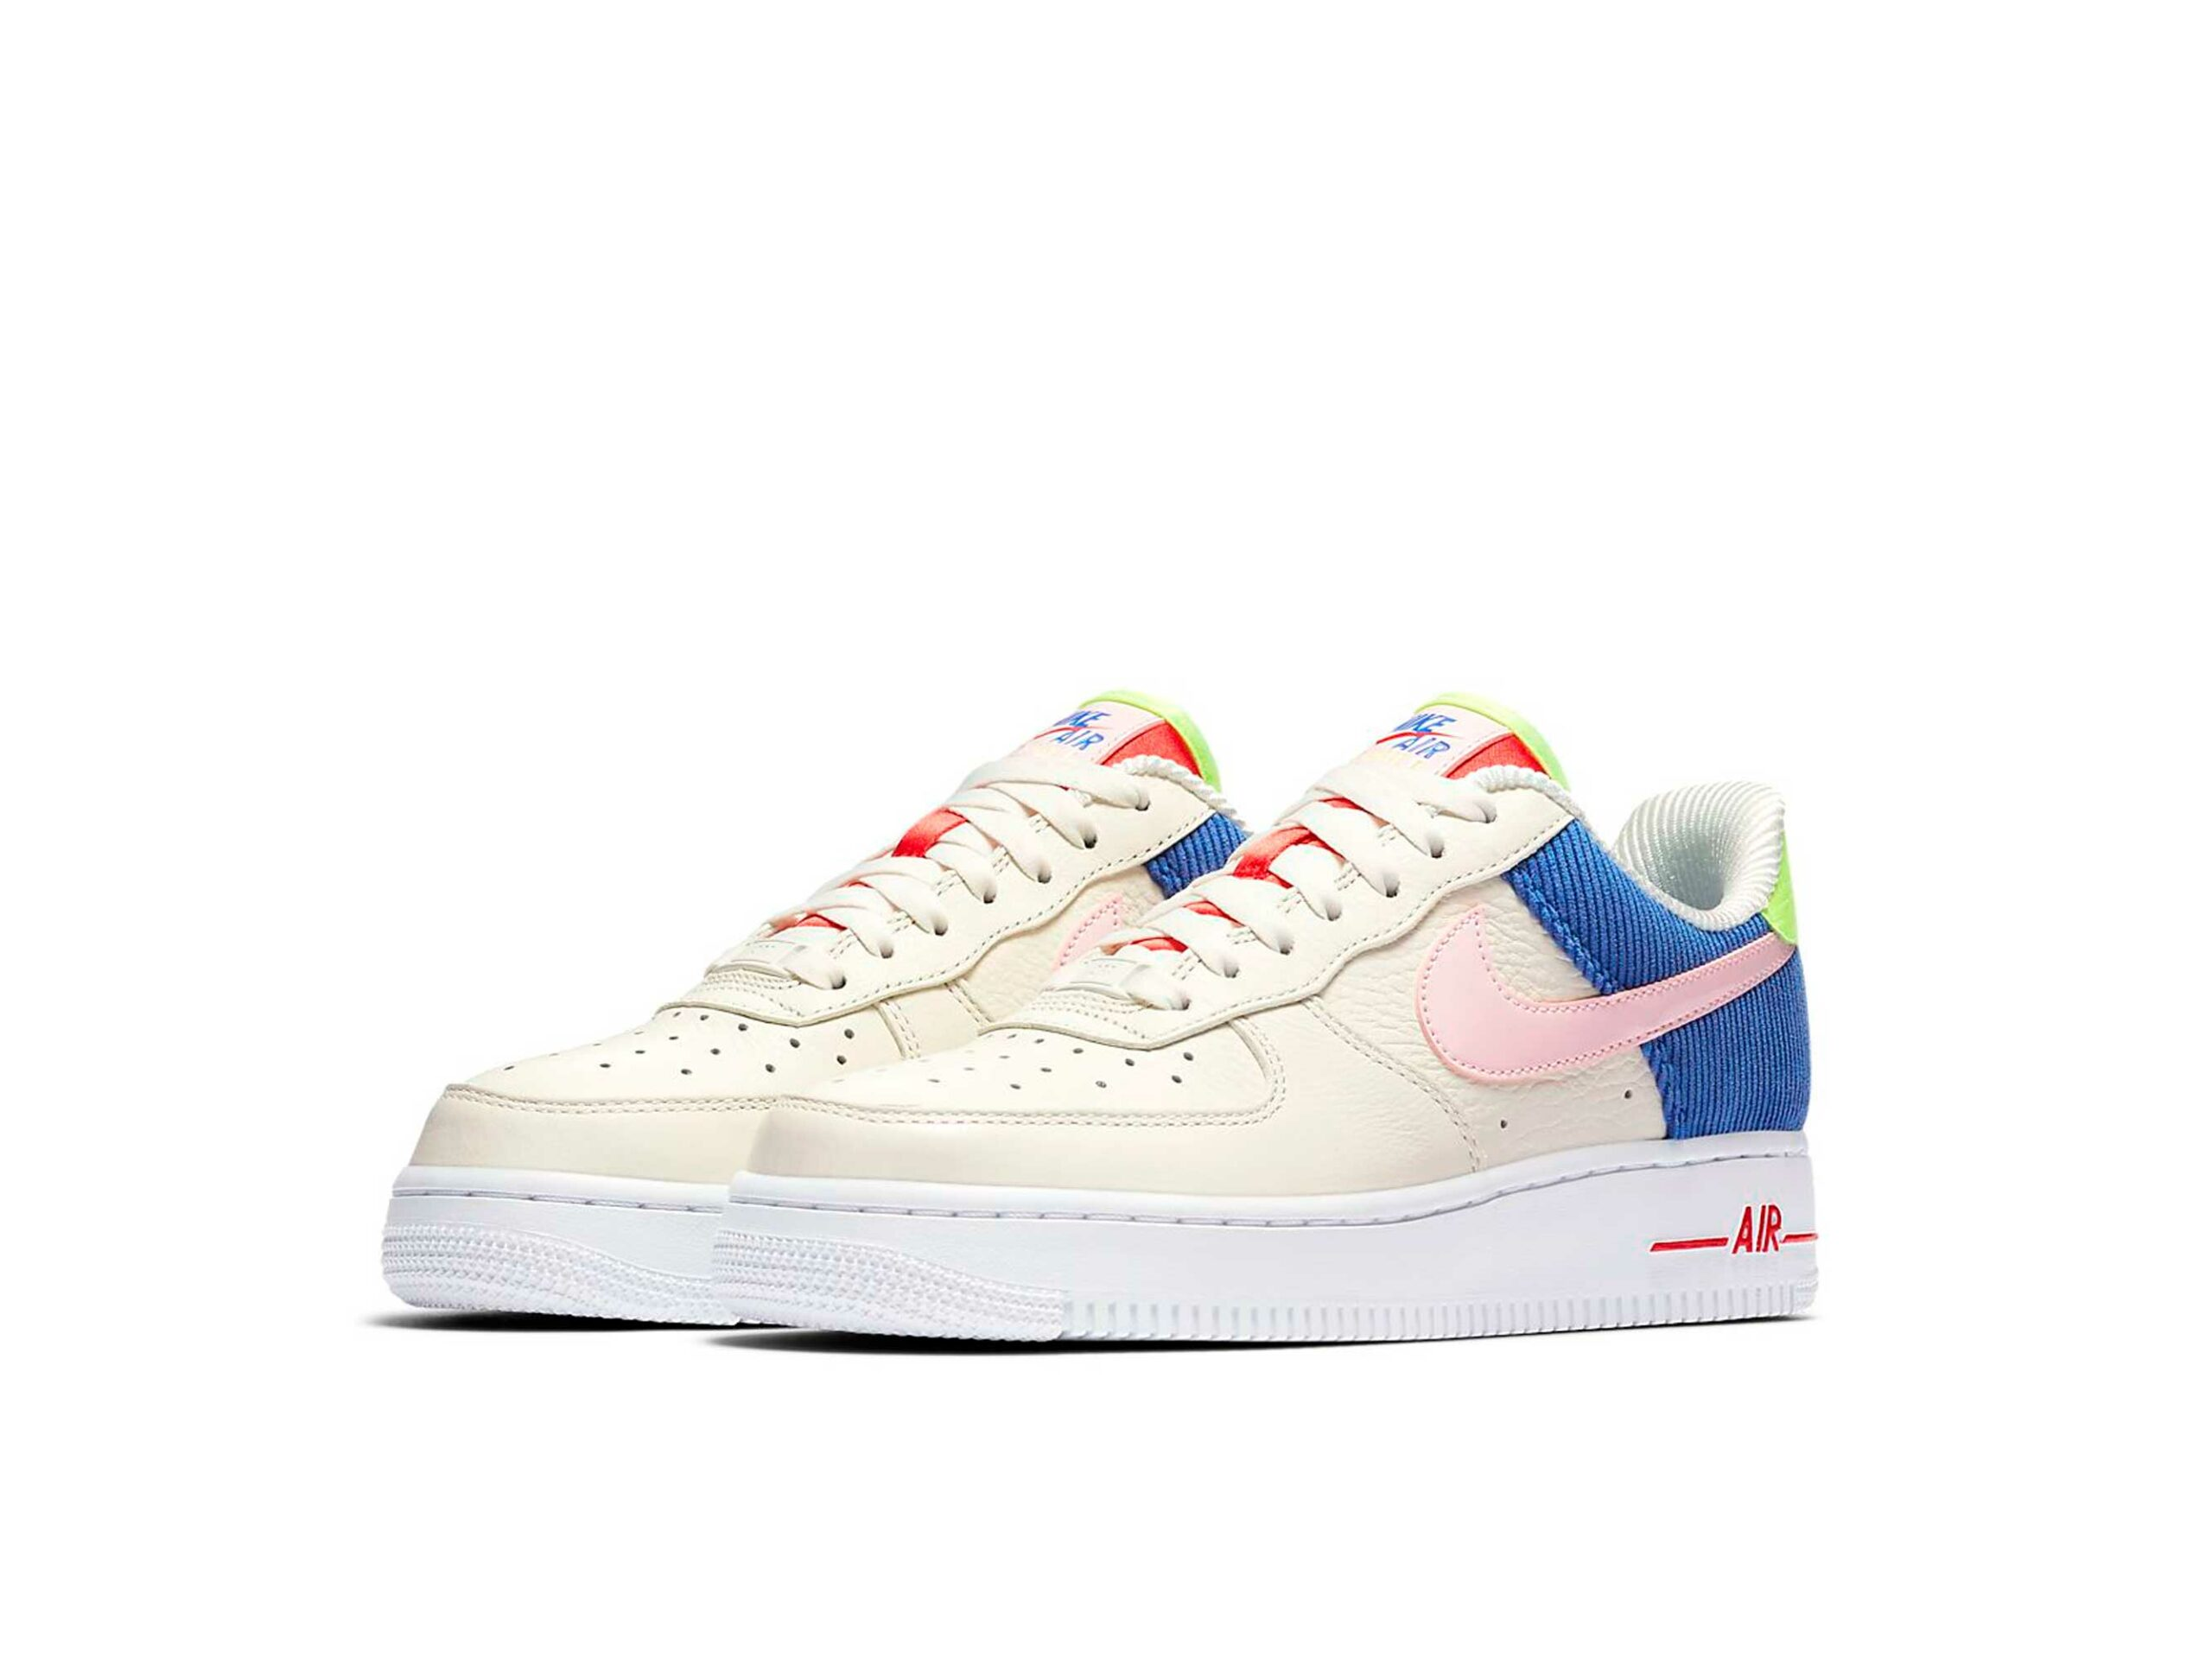 Nike Air Force 1 Low Corduroy AQ4139_101 купить